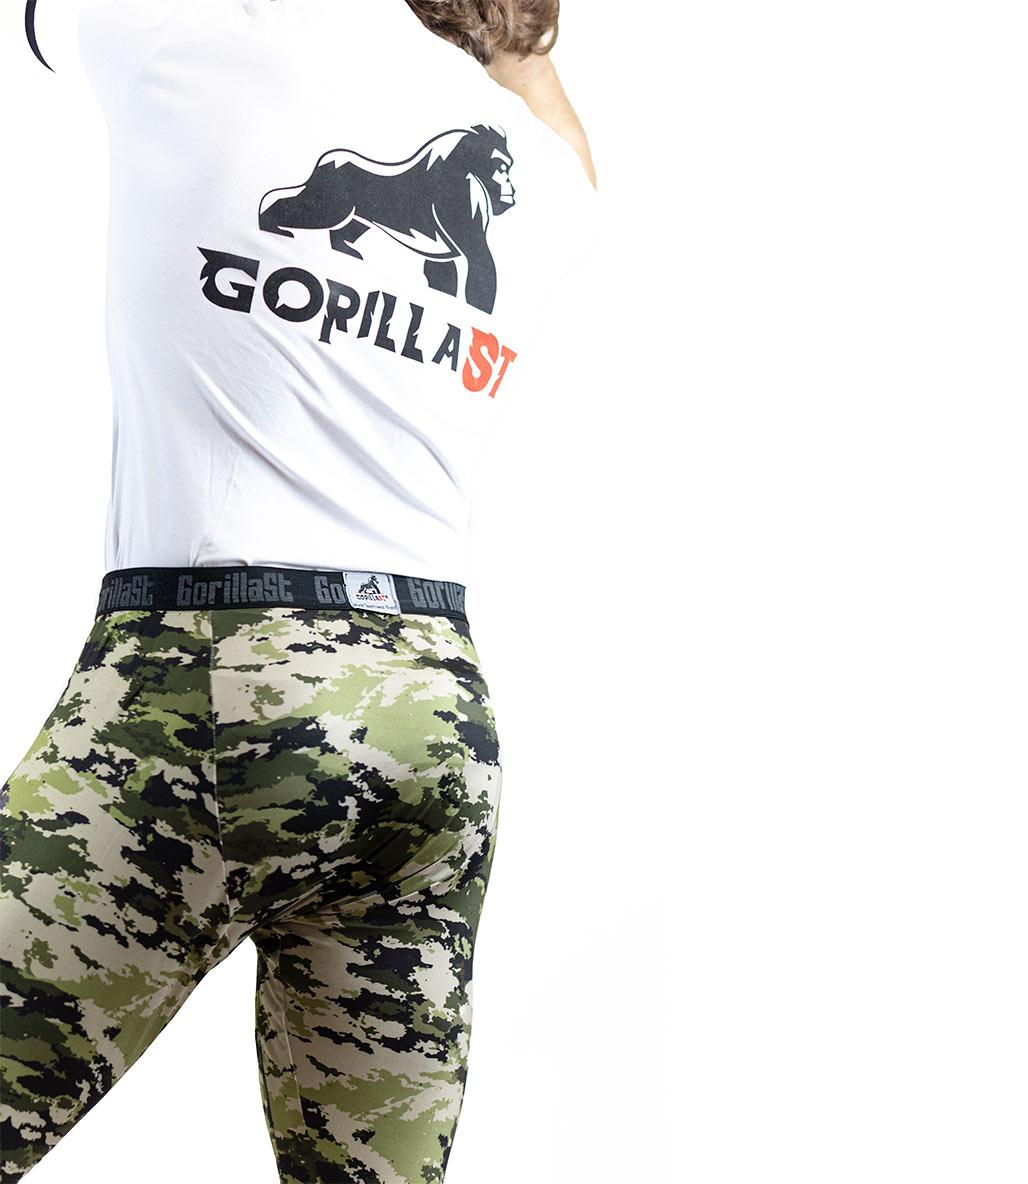 Gorillast Tayt Kamuflaj Yeşil